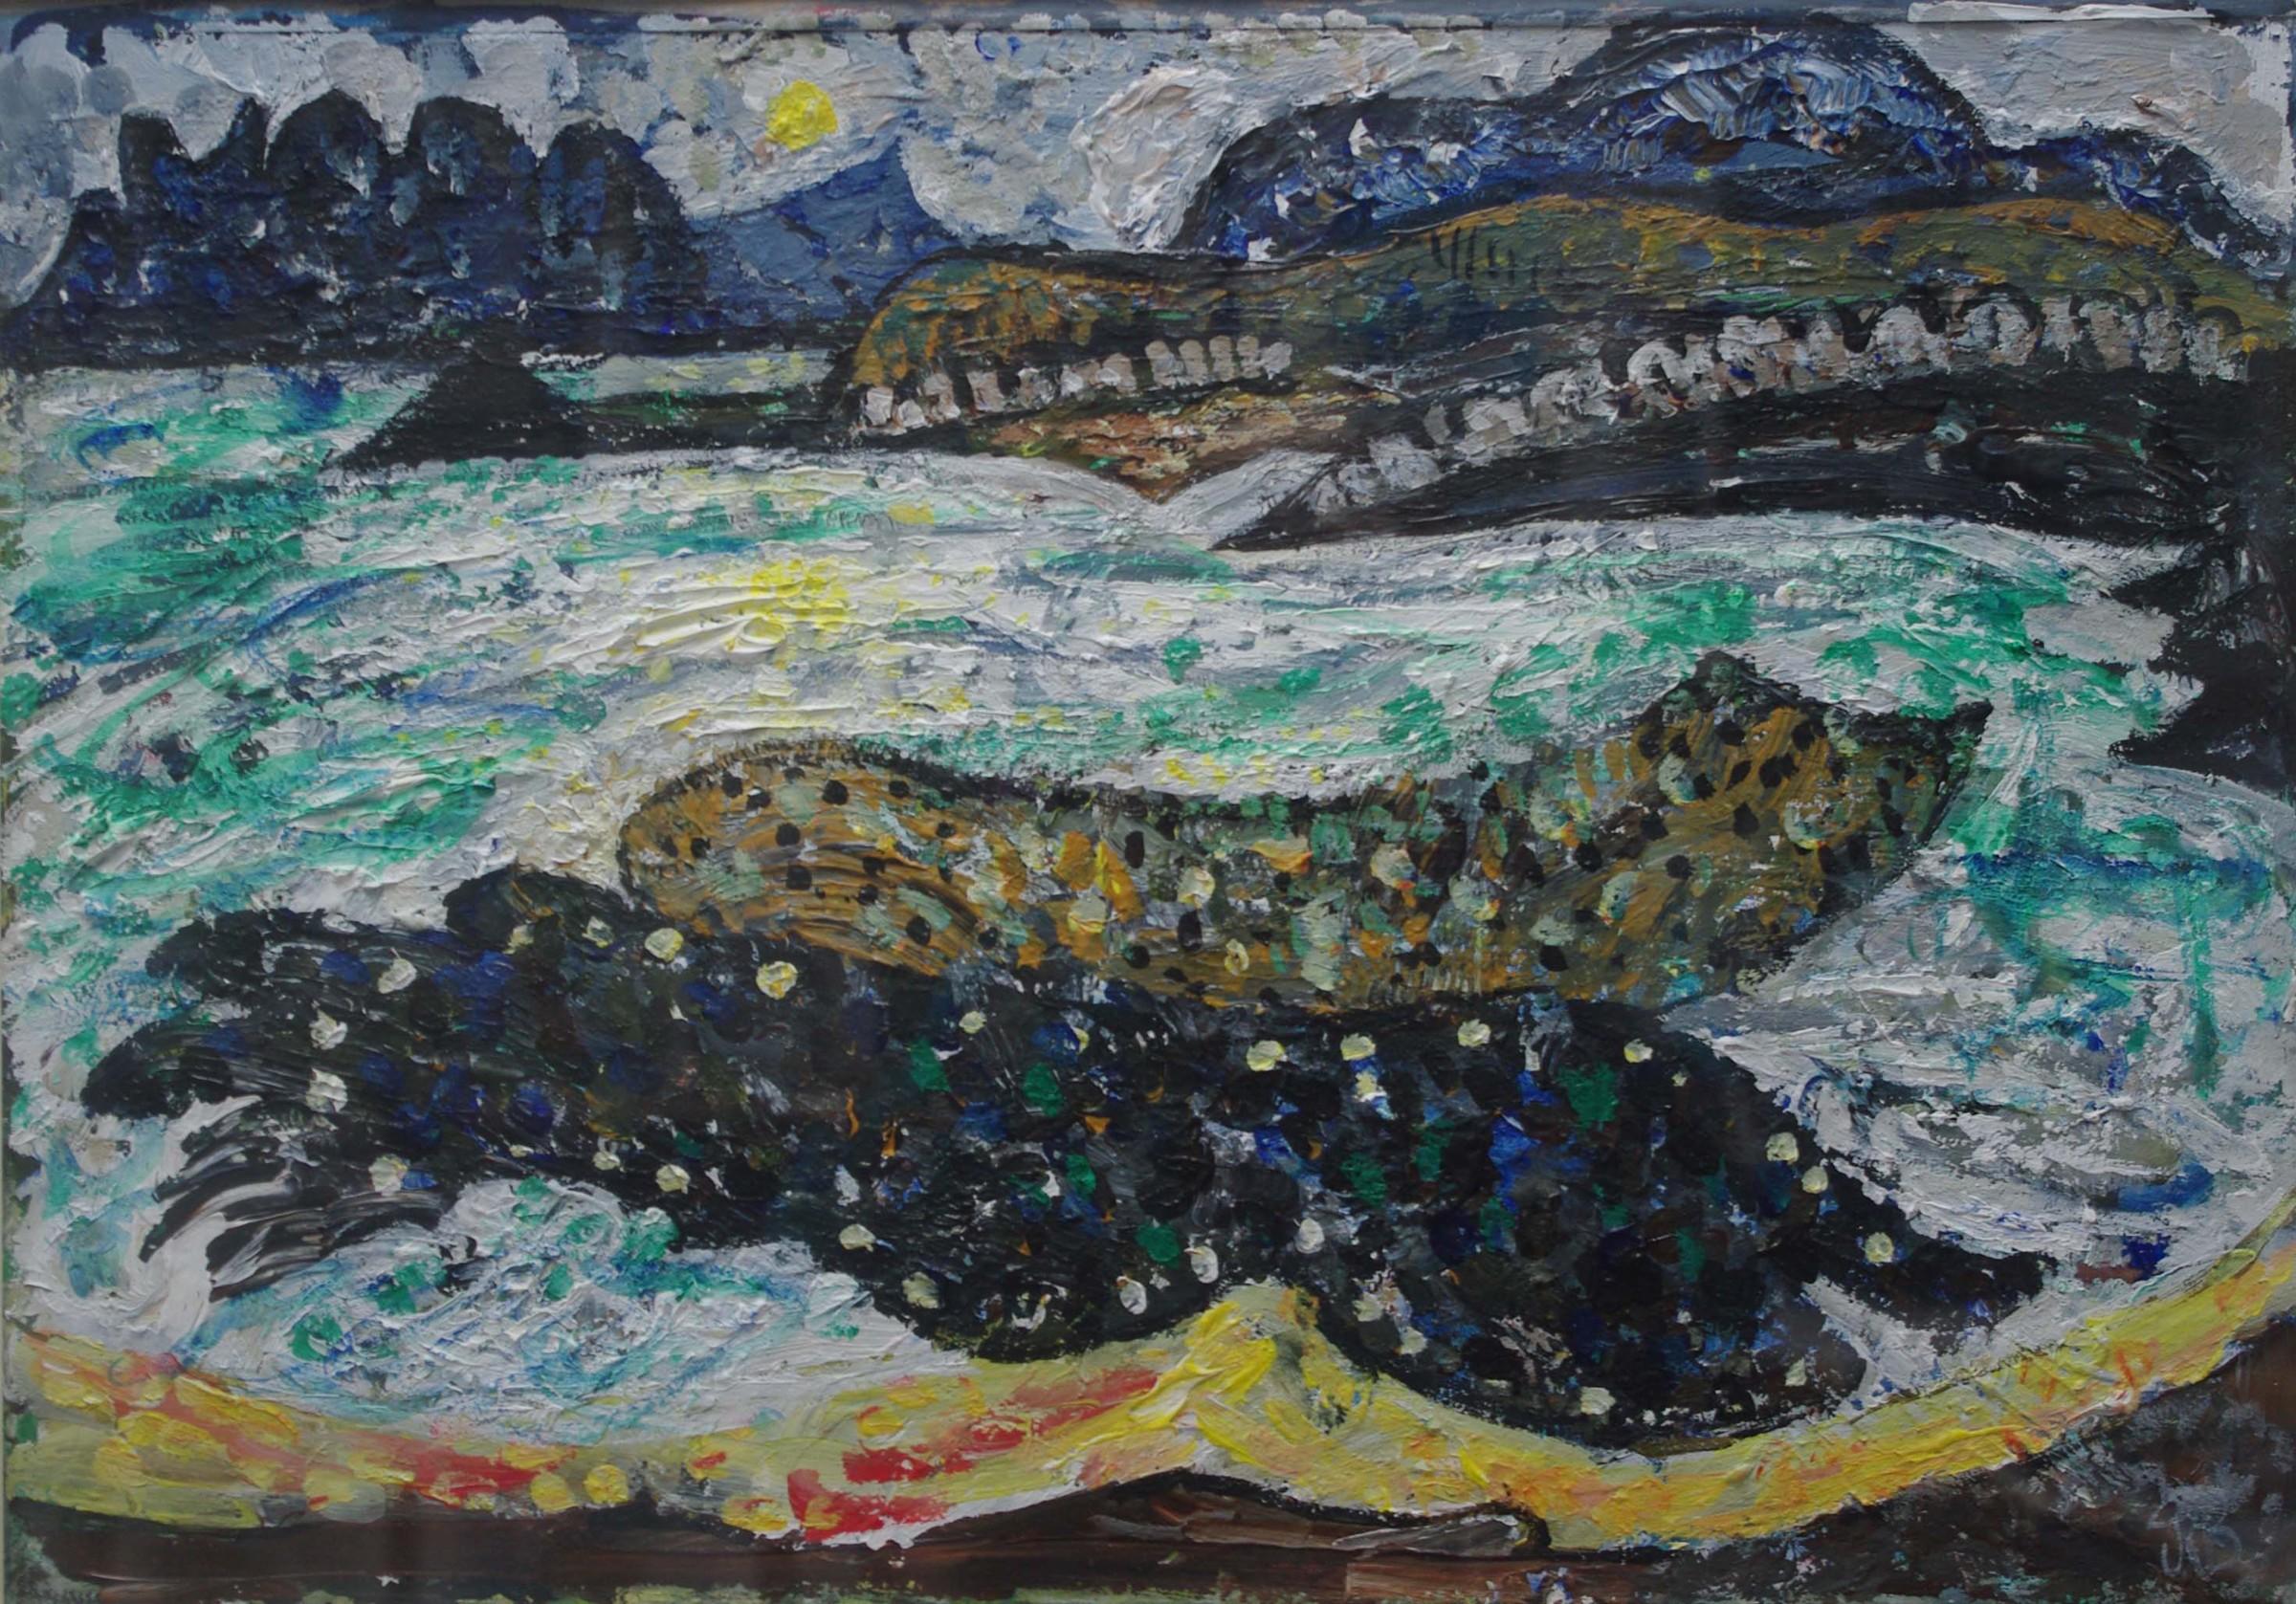 <span class=&#34;link fancybox-details-link&#34;><a href=&#34;/exhibitions/16/works/image_standalone361/&#34;>View Detail Page</a></span><p>John Roger Bradley,&#160;<em>East of Grimsay</em>, &#163;750</p>